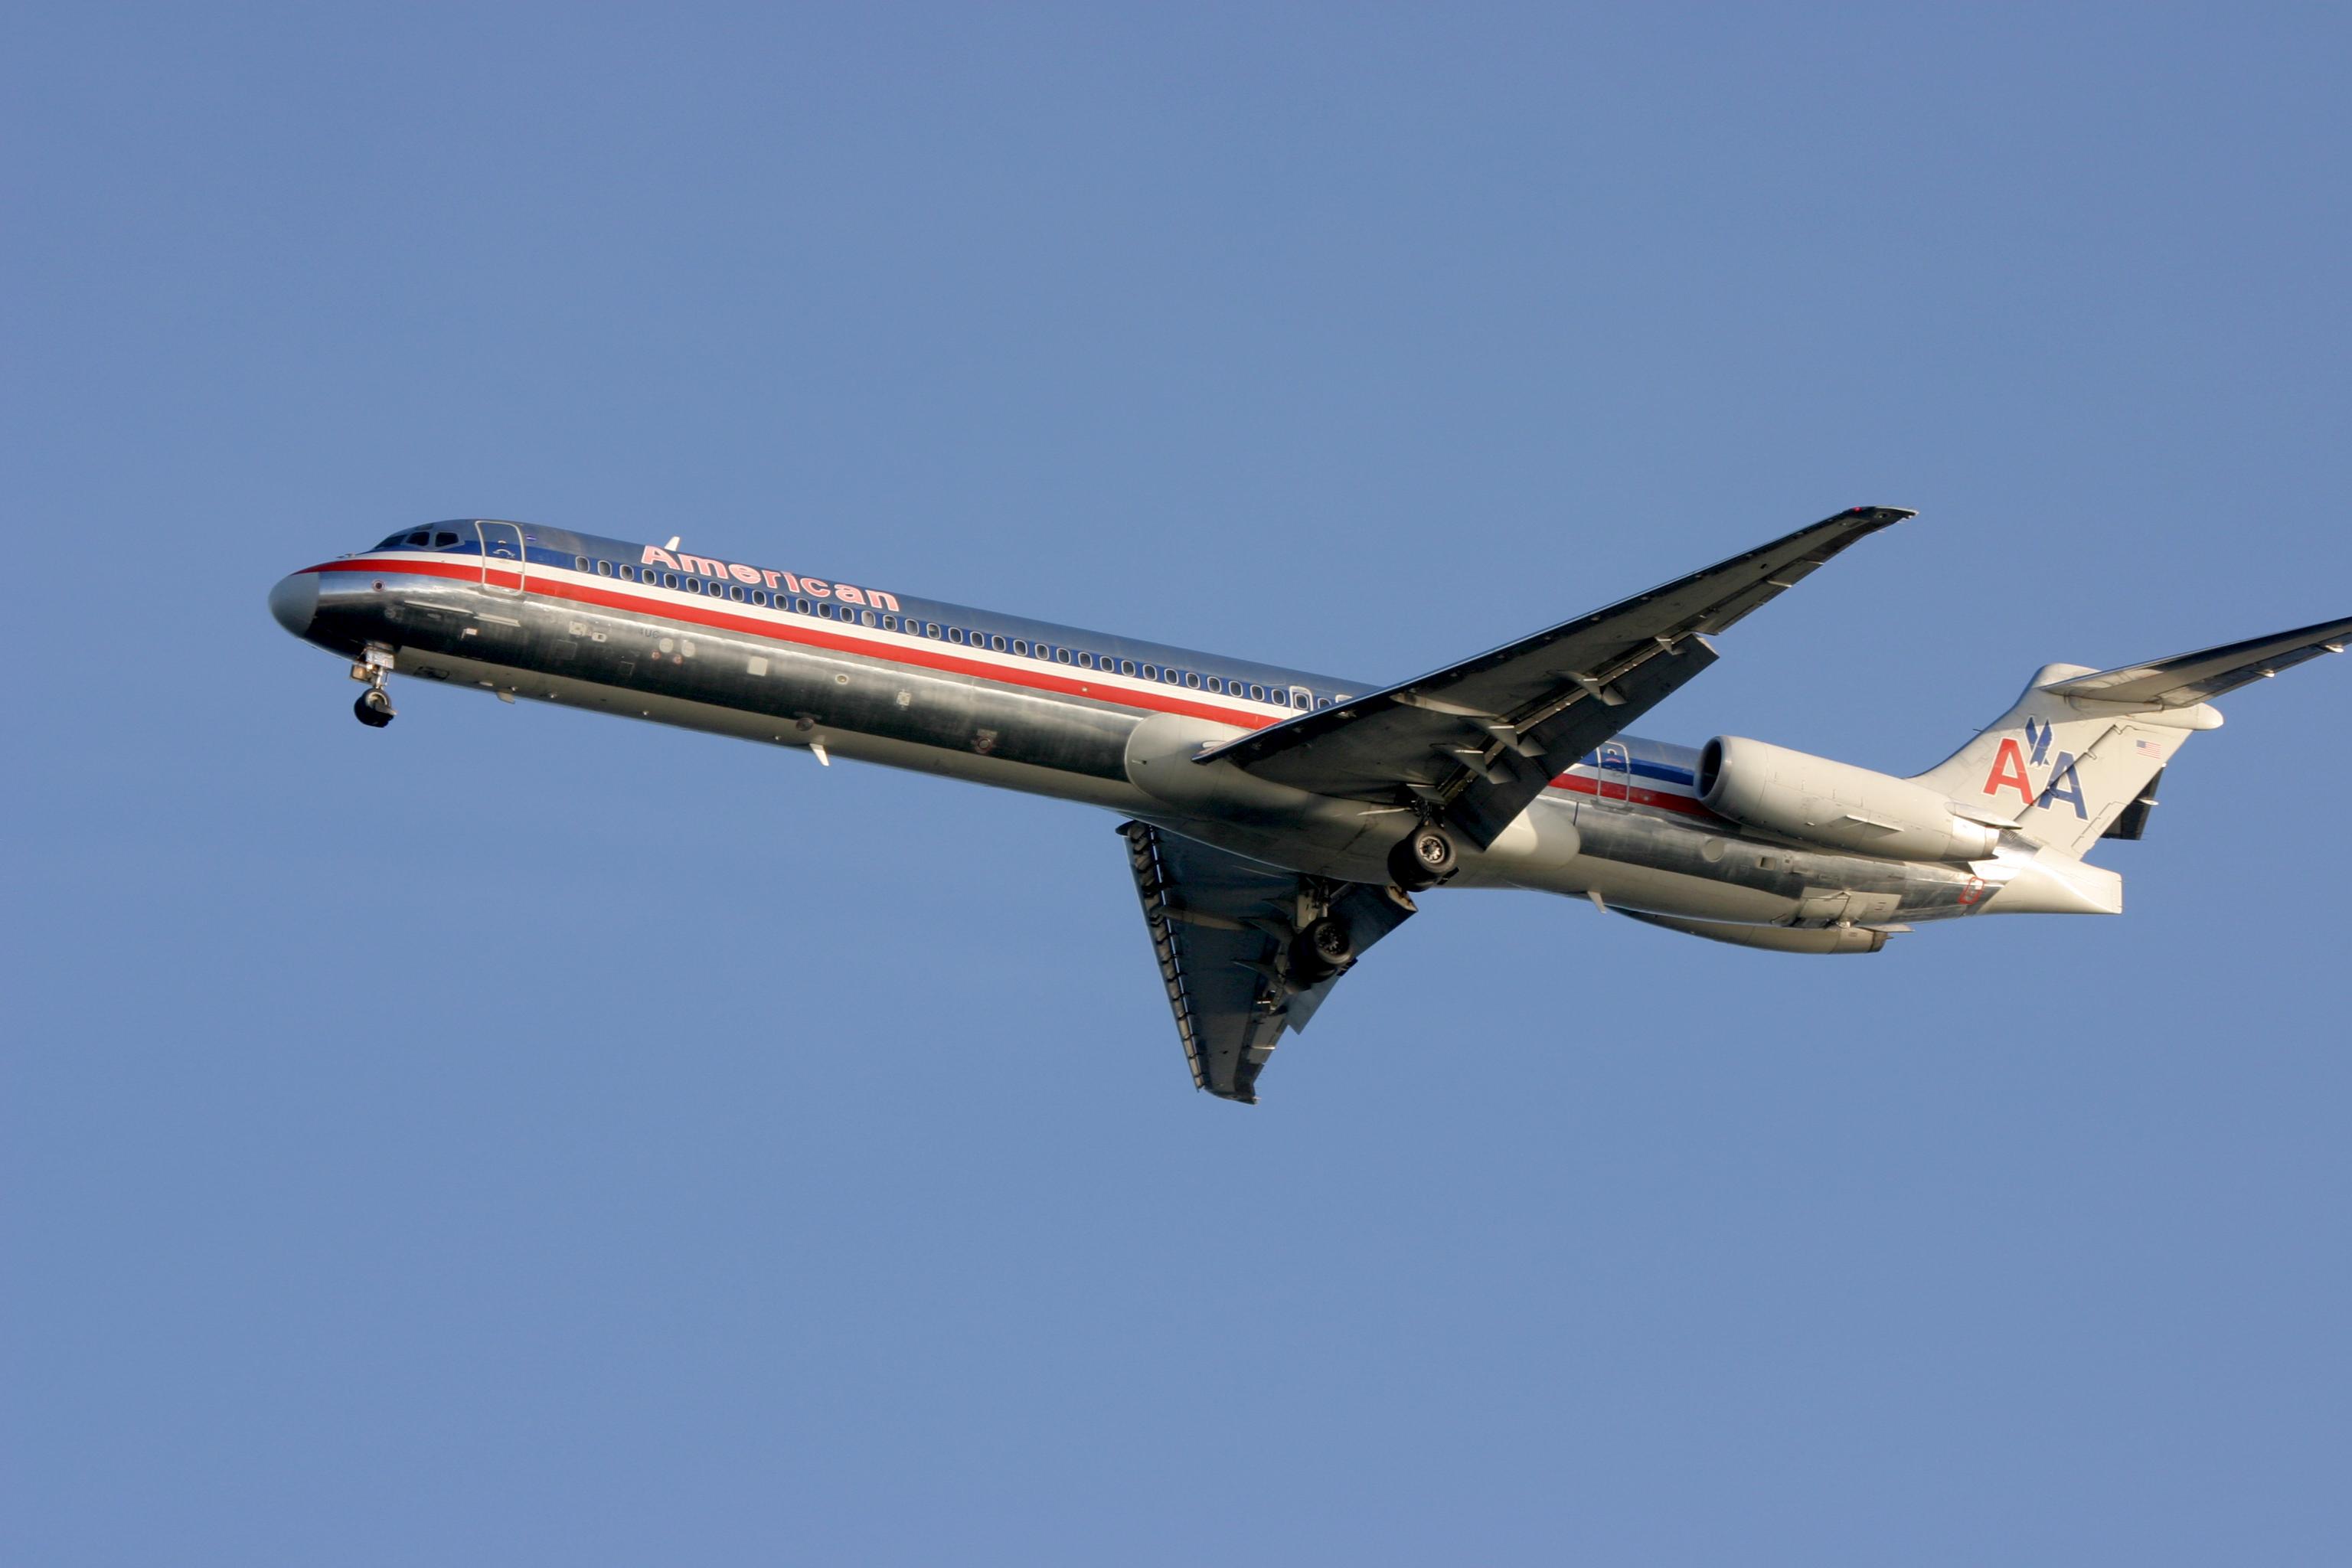 File:American Airlines.MD-80.BOS.2006.jpg